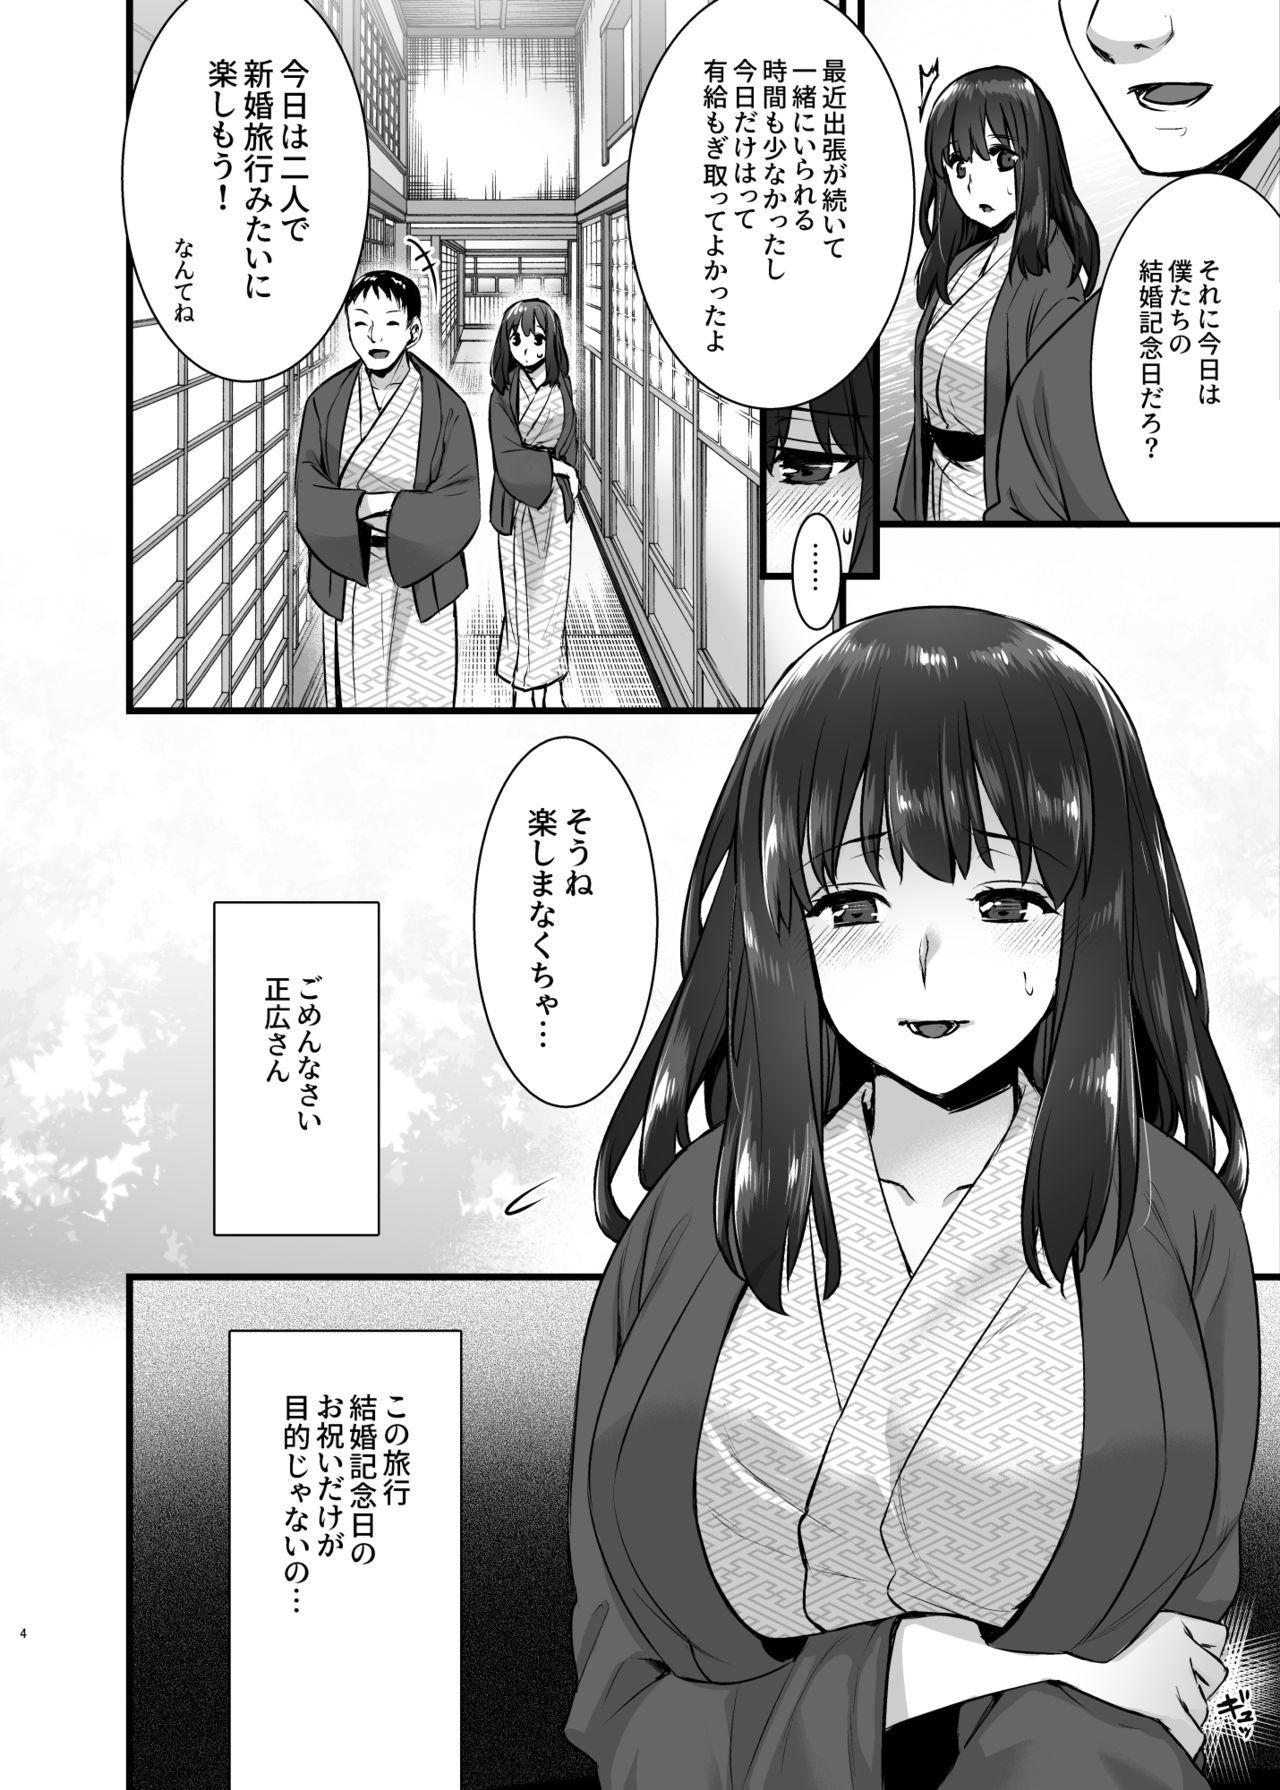 Rental Tanetsuke Oji-san 2 After 2